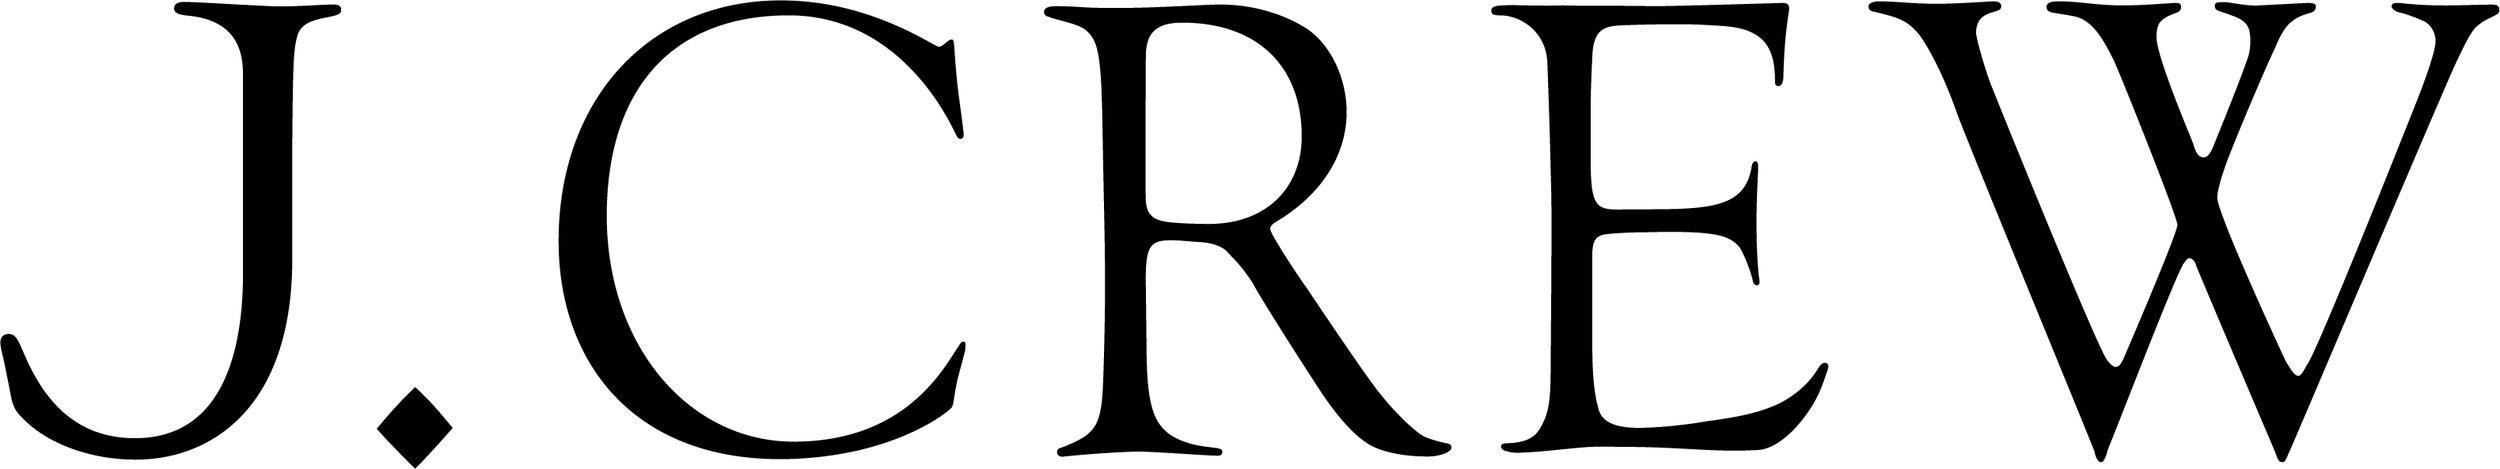 Logo_JC_2019_OL.jpg